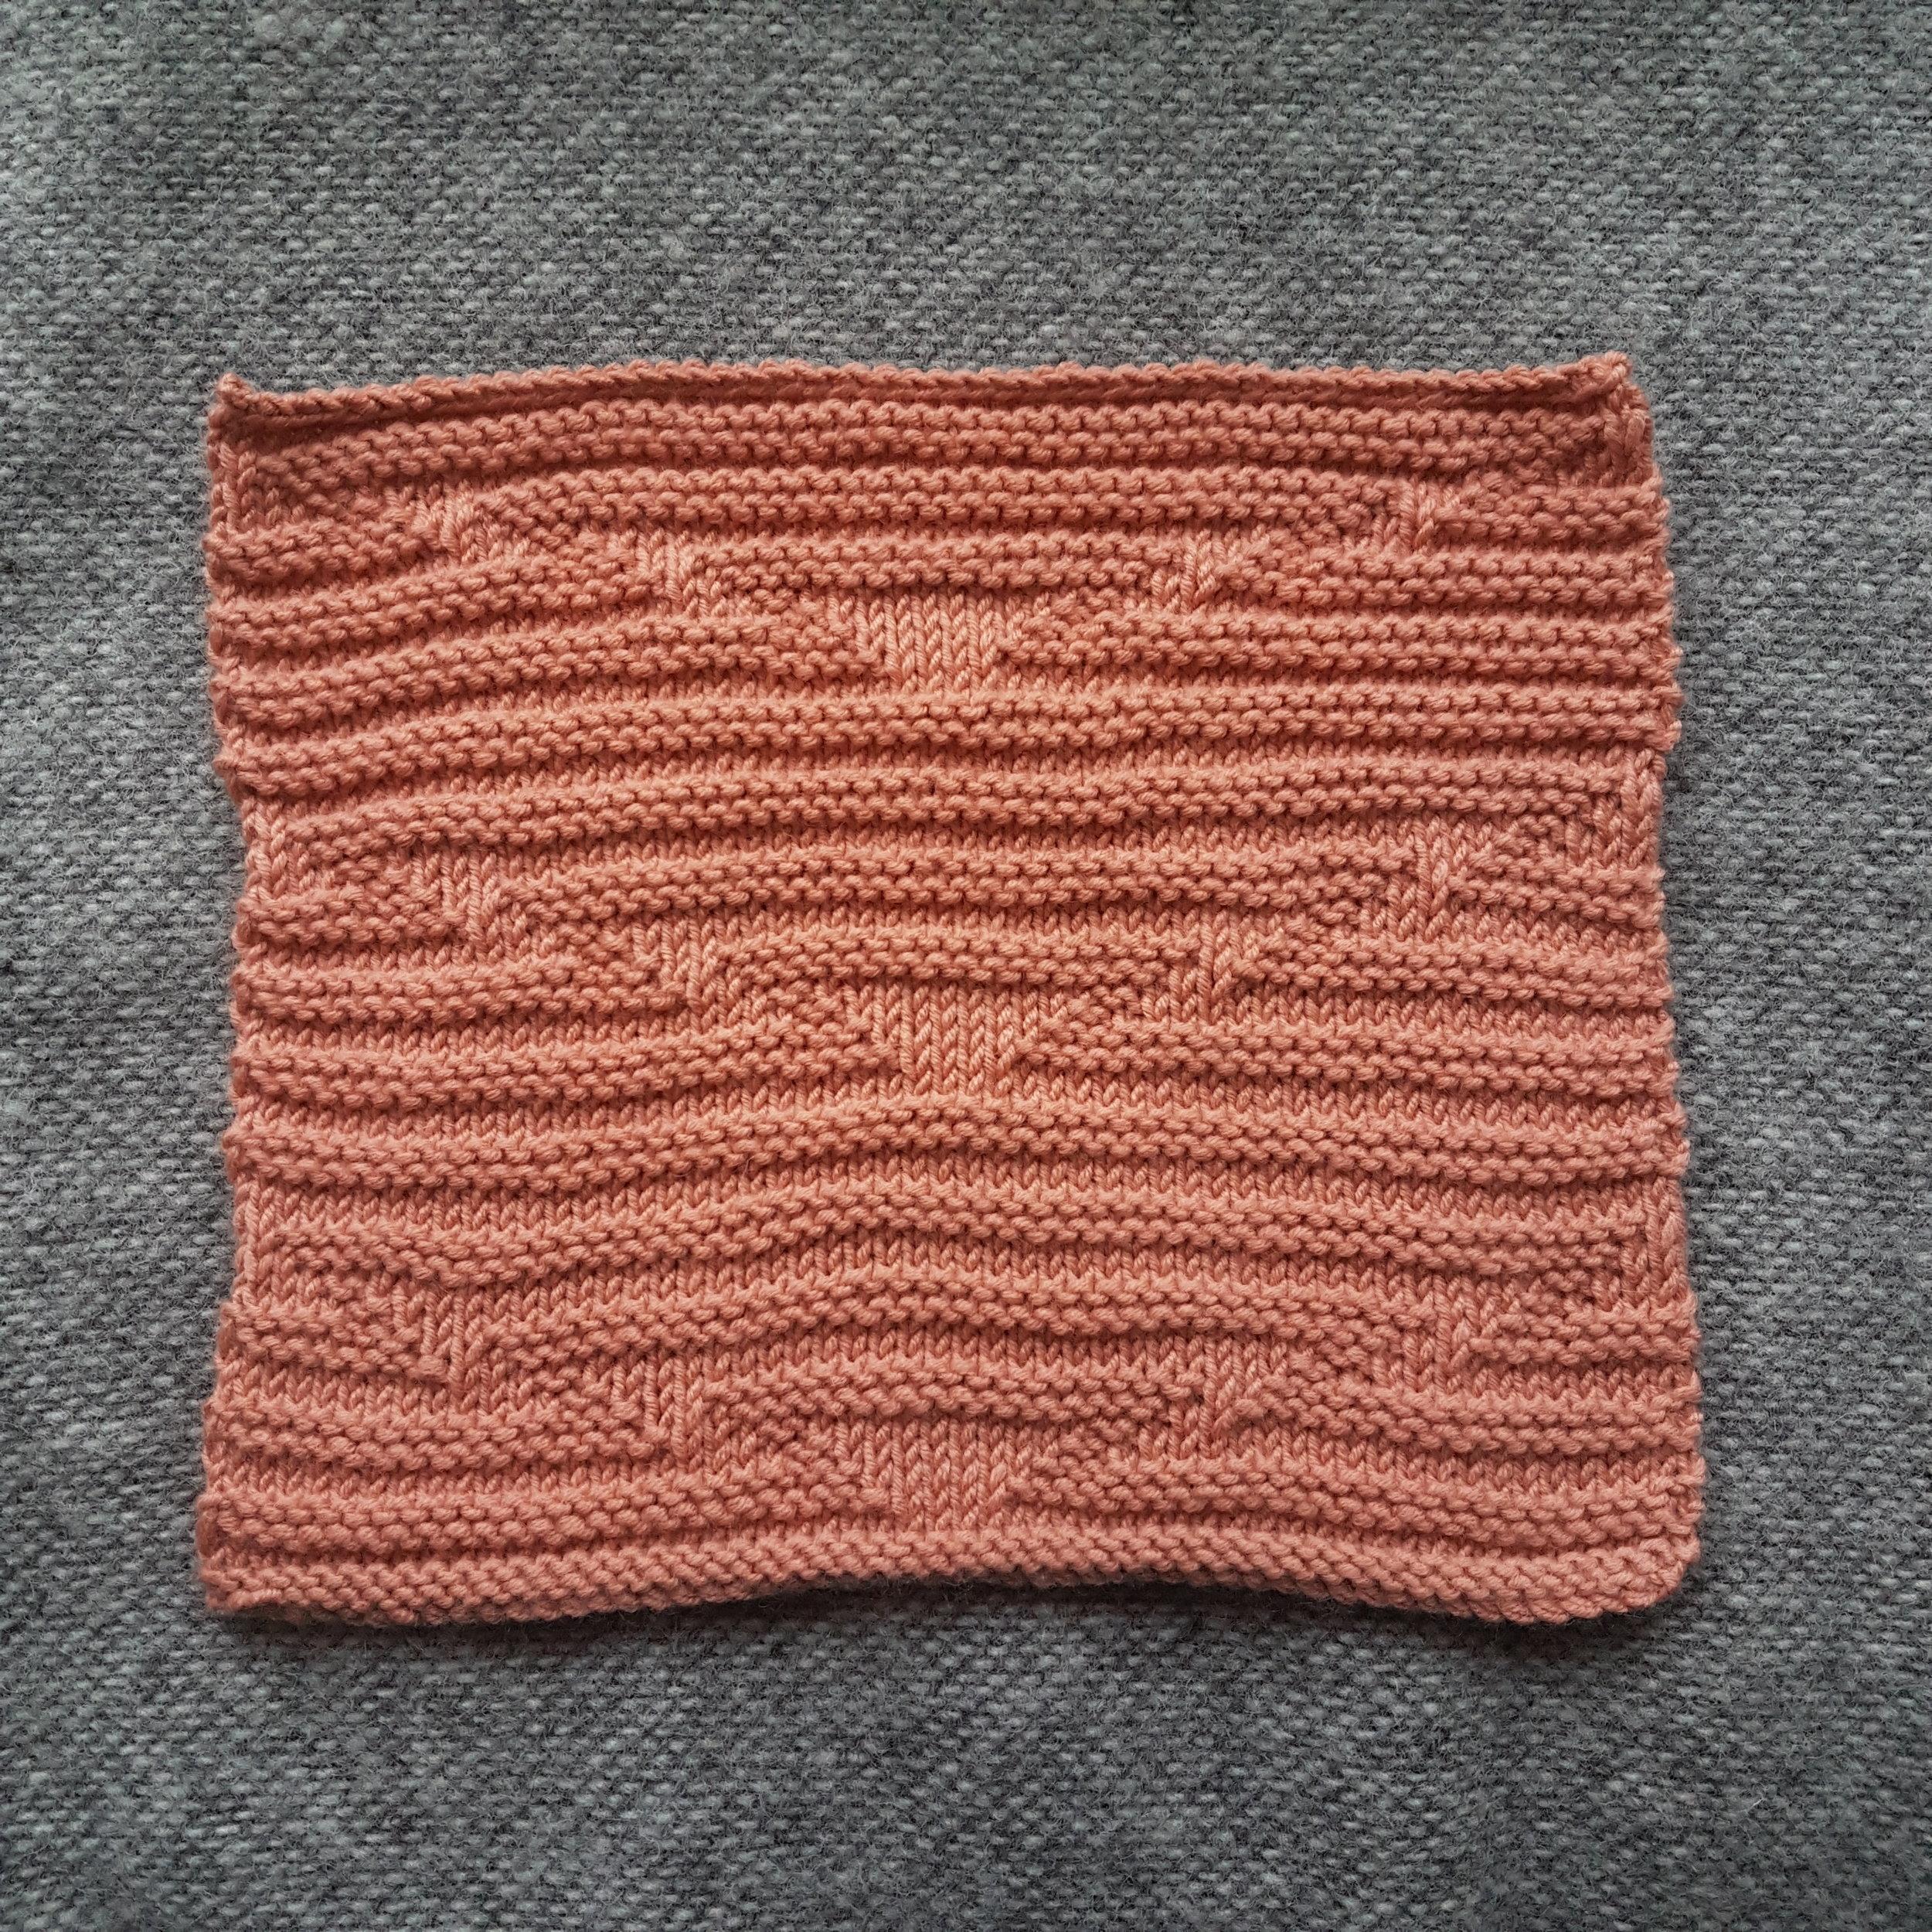 Delaunay Knitting Stitch: Front